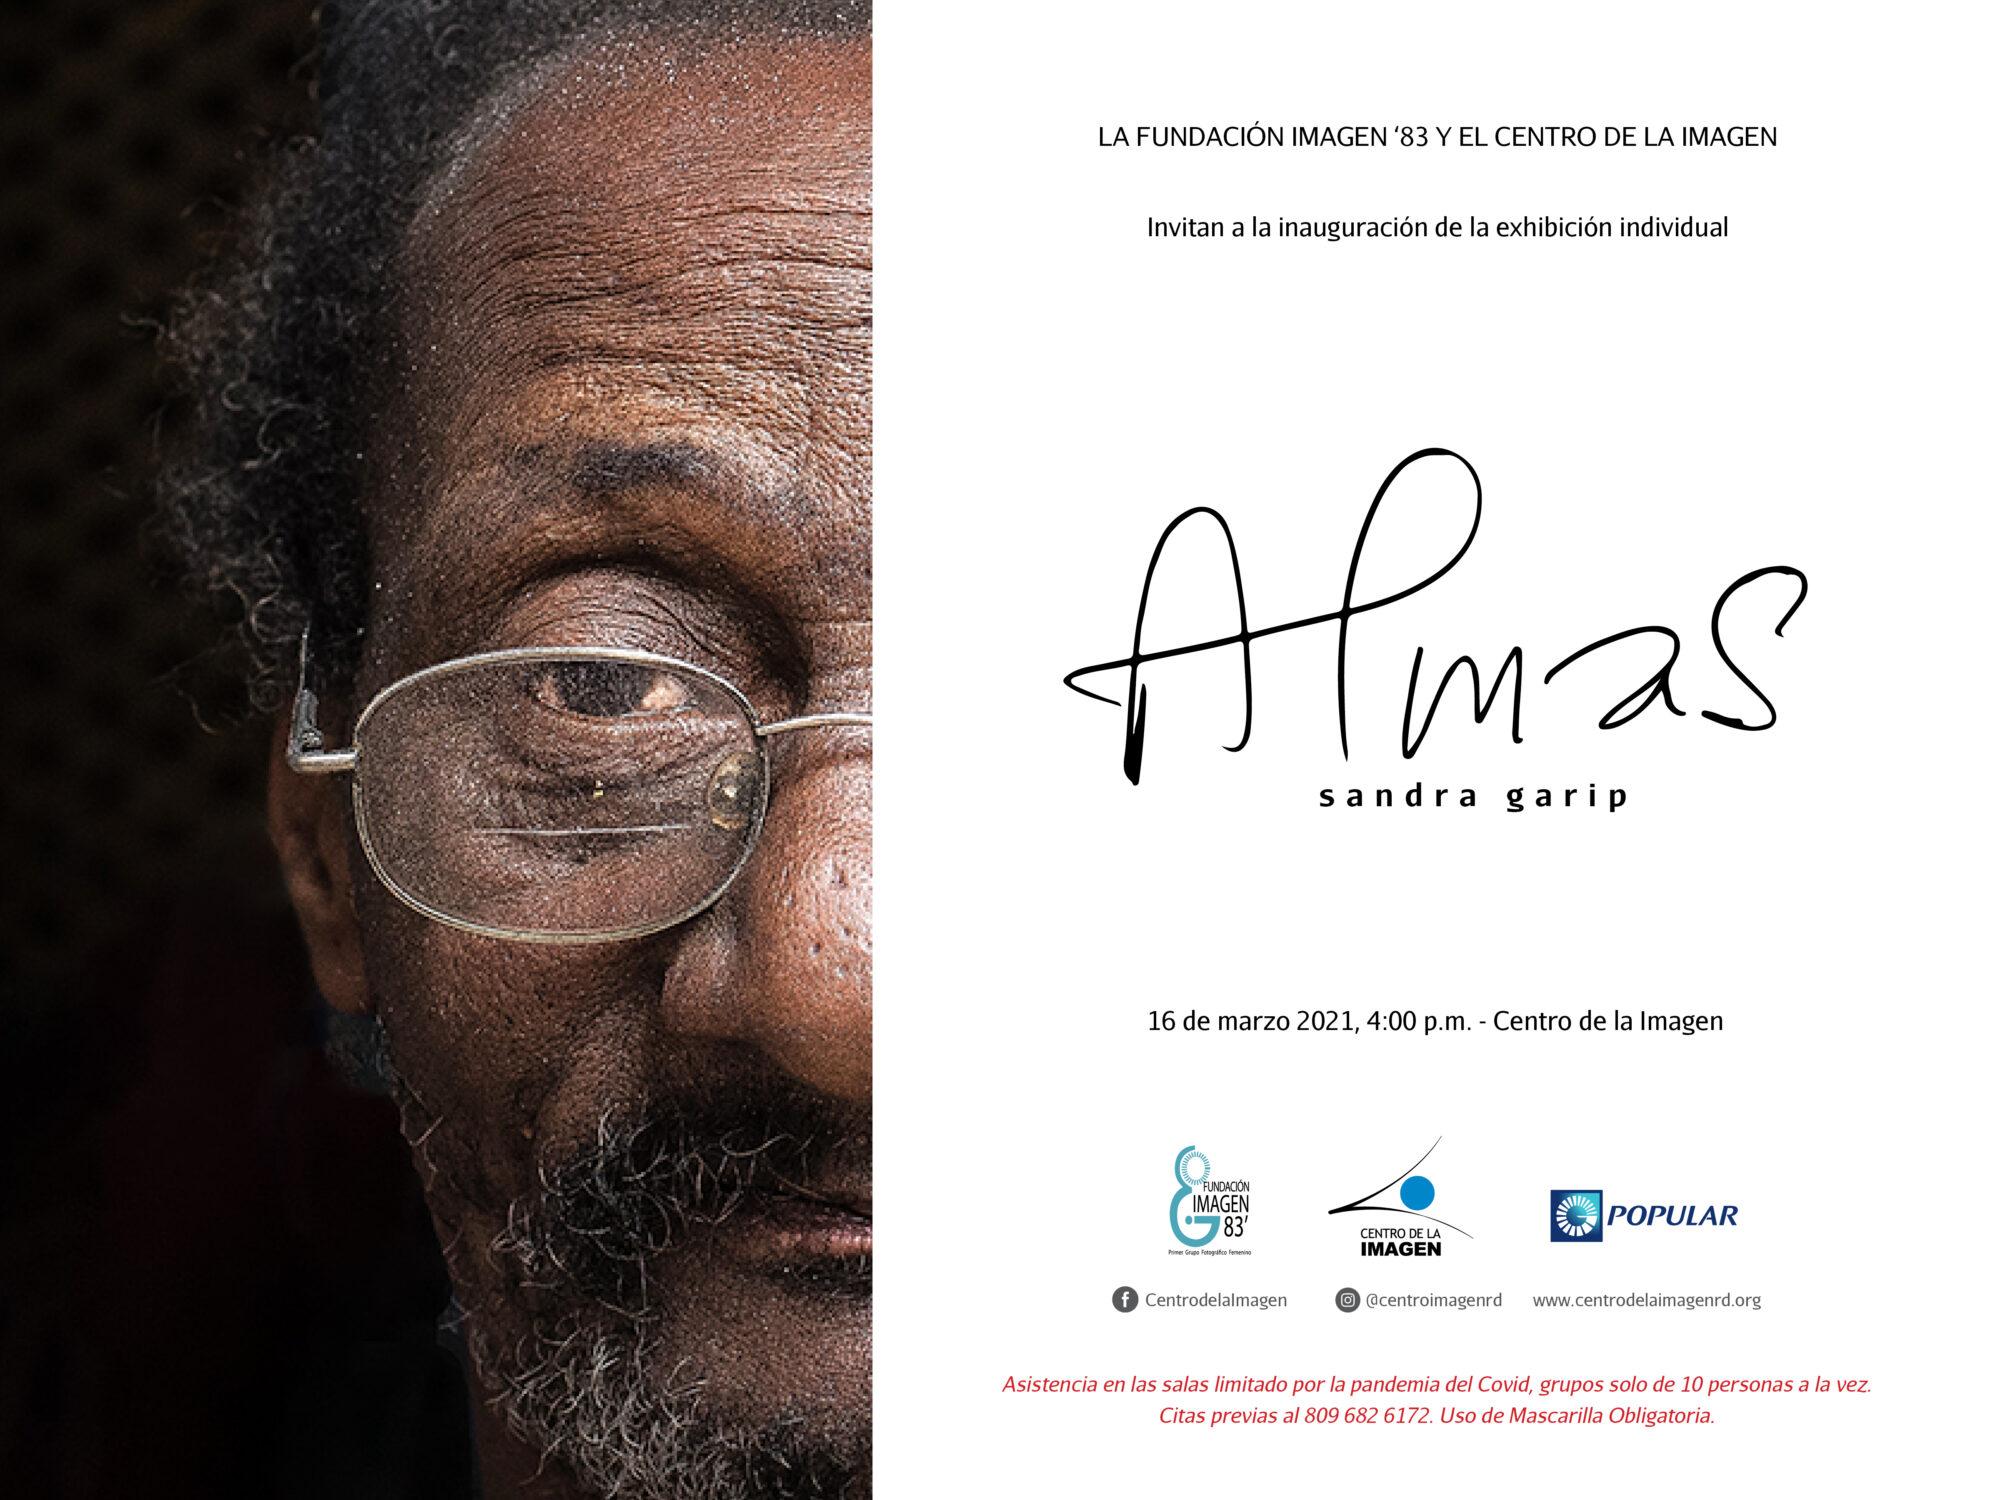 Almas - Sandra Garip